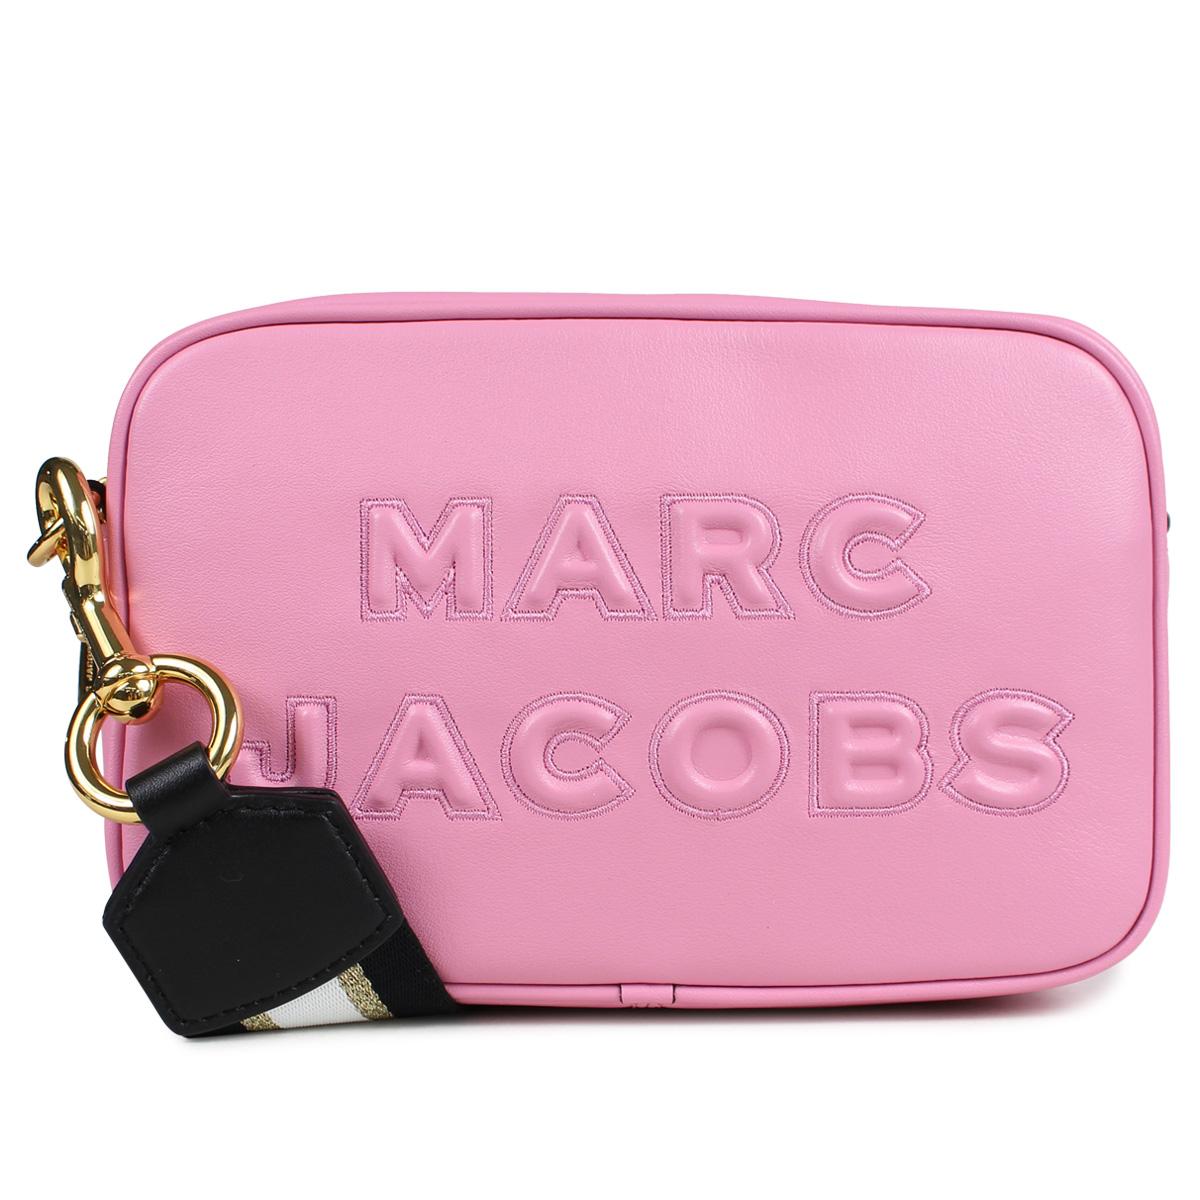 MARC JACOBS FLASH LEATHER CROSS BODY マークジェイコブス バッグ ショルダーバッグ レディース ピンク M0014465 660